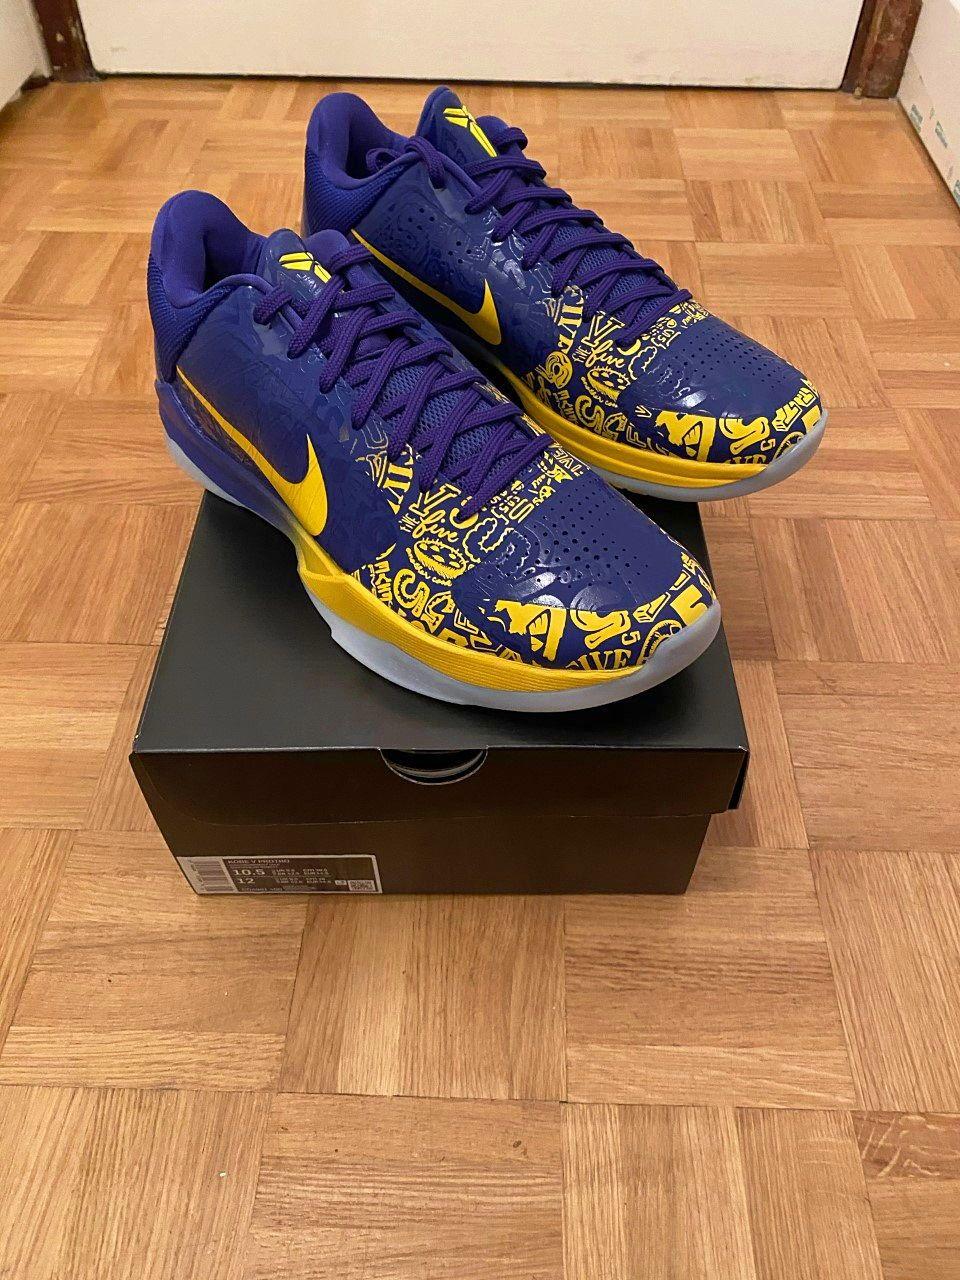 Vends chaussures Nike Kobe 5Protro 5rings (44,5) (NEUVES)